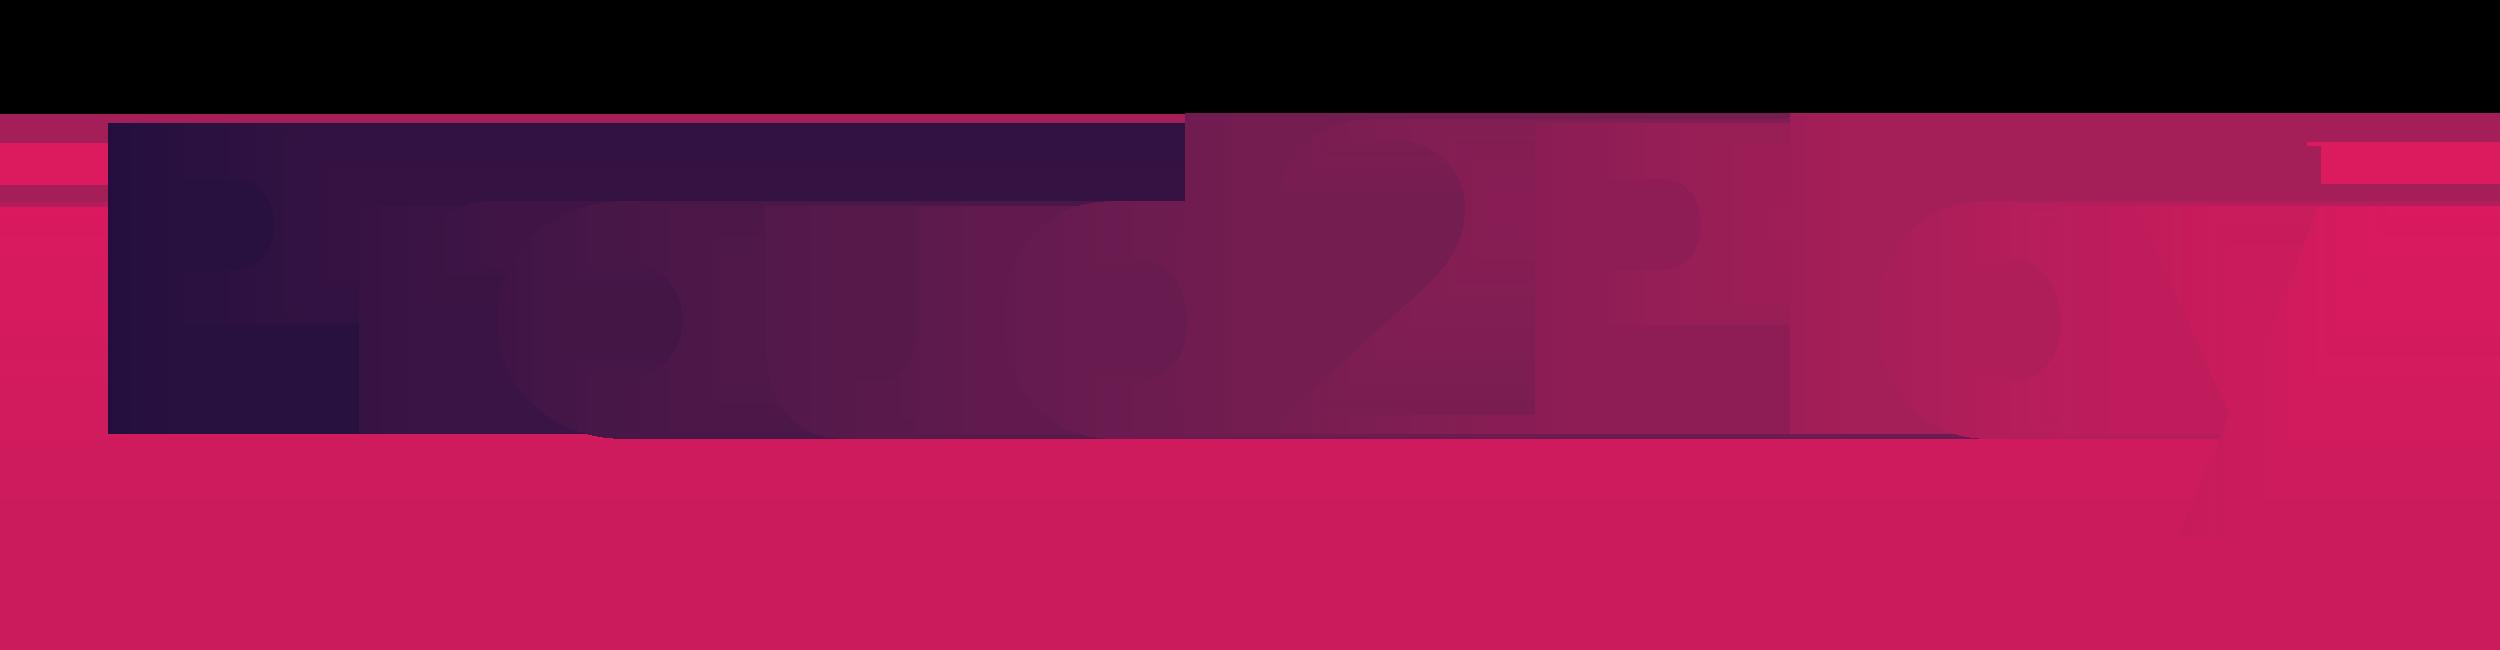 Proud 2 Play logo